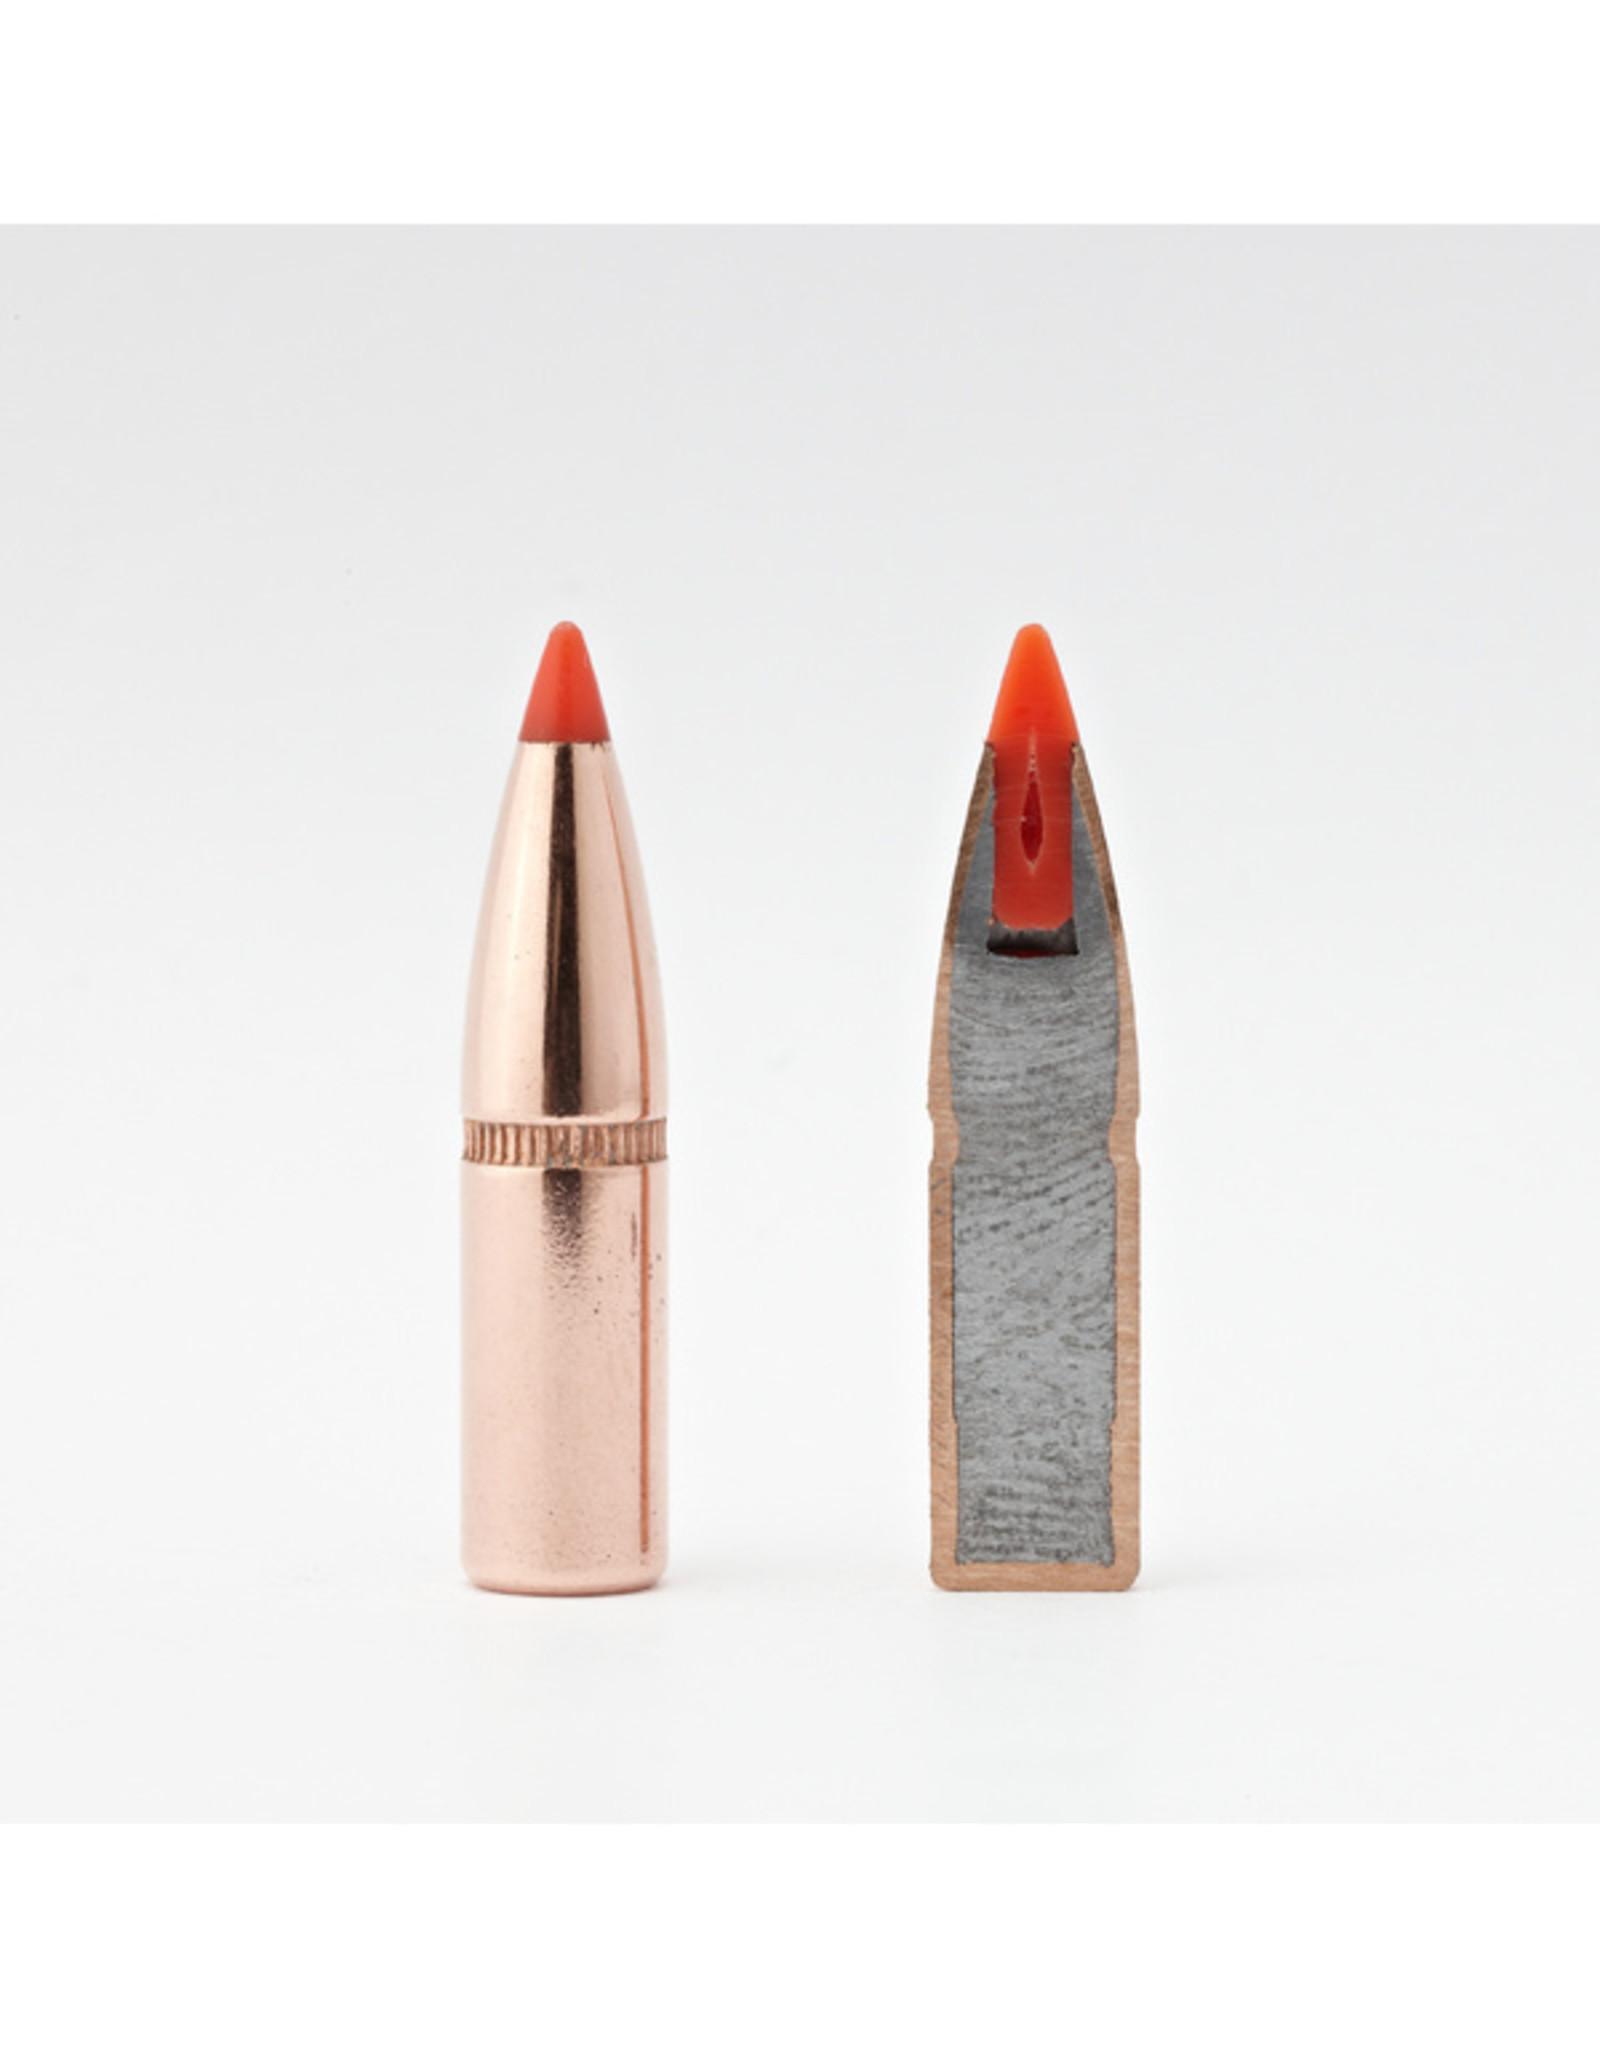 HORNADY - BULLETS Hornady Bullets 6mm .243 95 gr SST